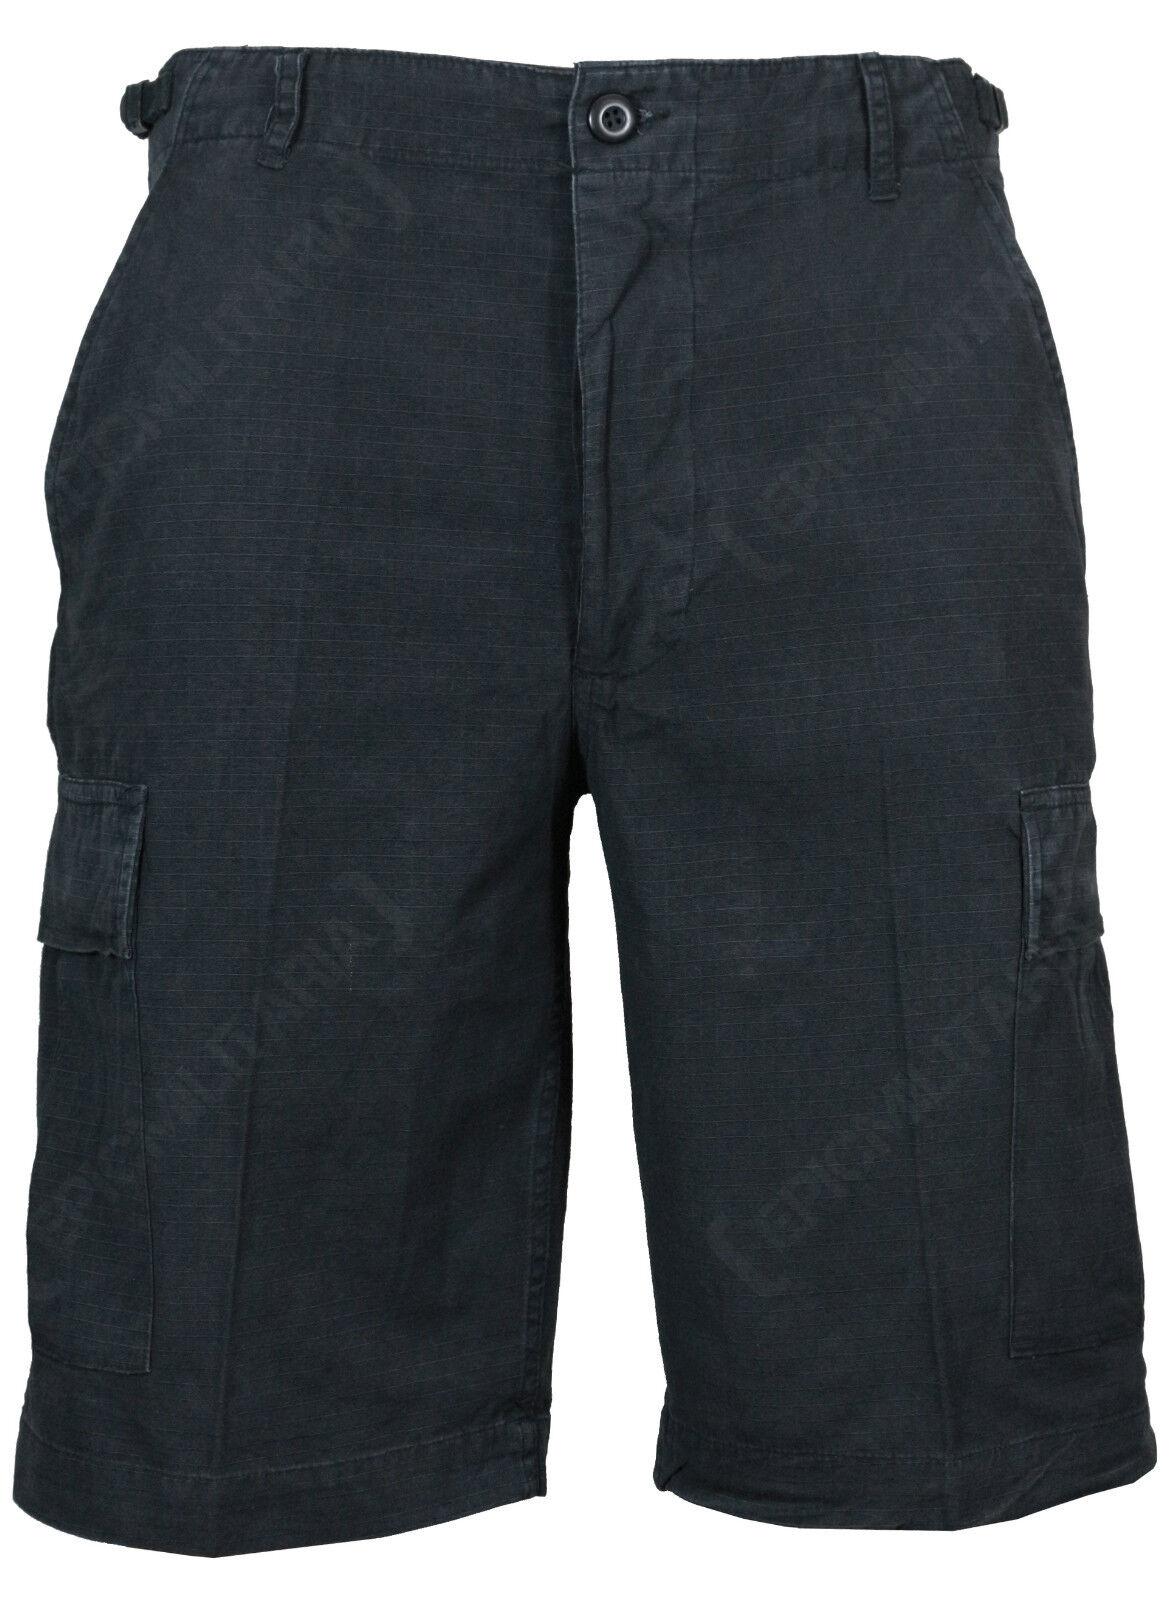 BDU Cargo pantaloncini neri - Tutte Le Misure - 100% Cotone RIPSTOP Combat